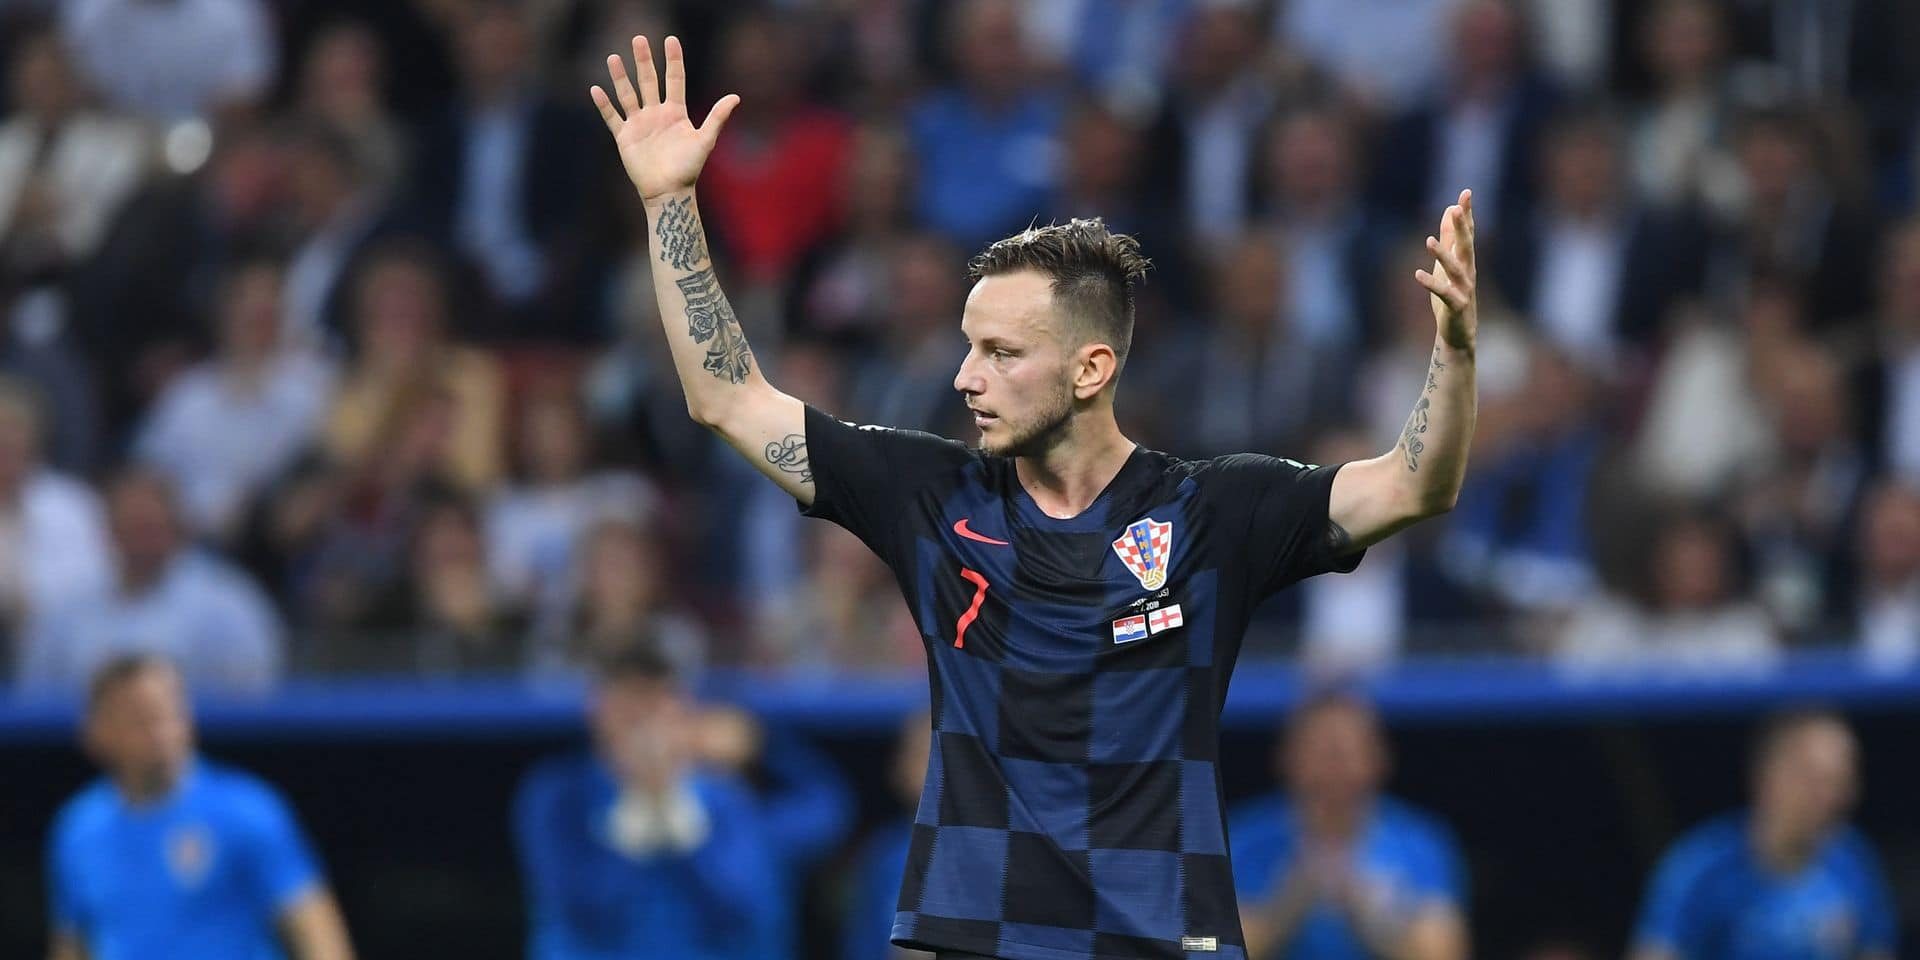 Le Croate Ivan Rakitic arrête sa carrière internationale